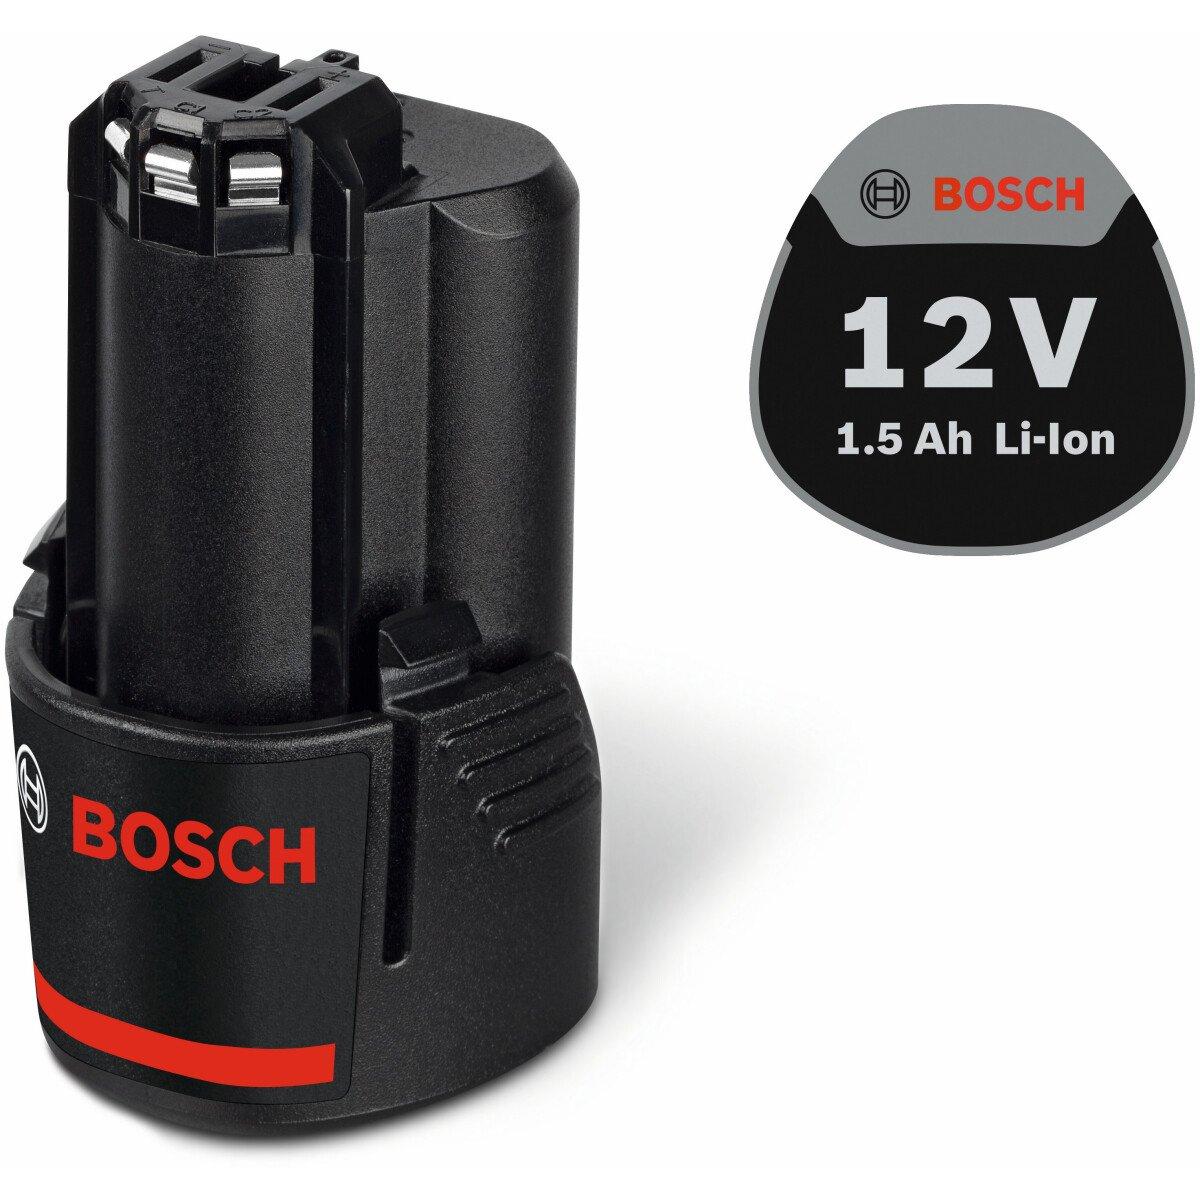 Bosch GBA 12V 2.0 Ah Battery Pack